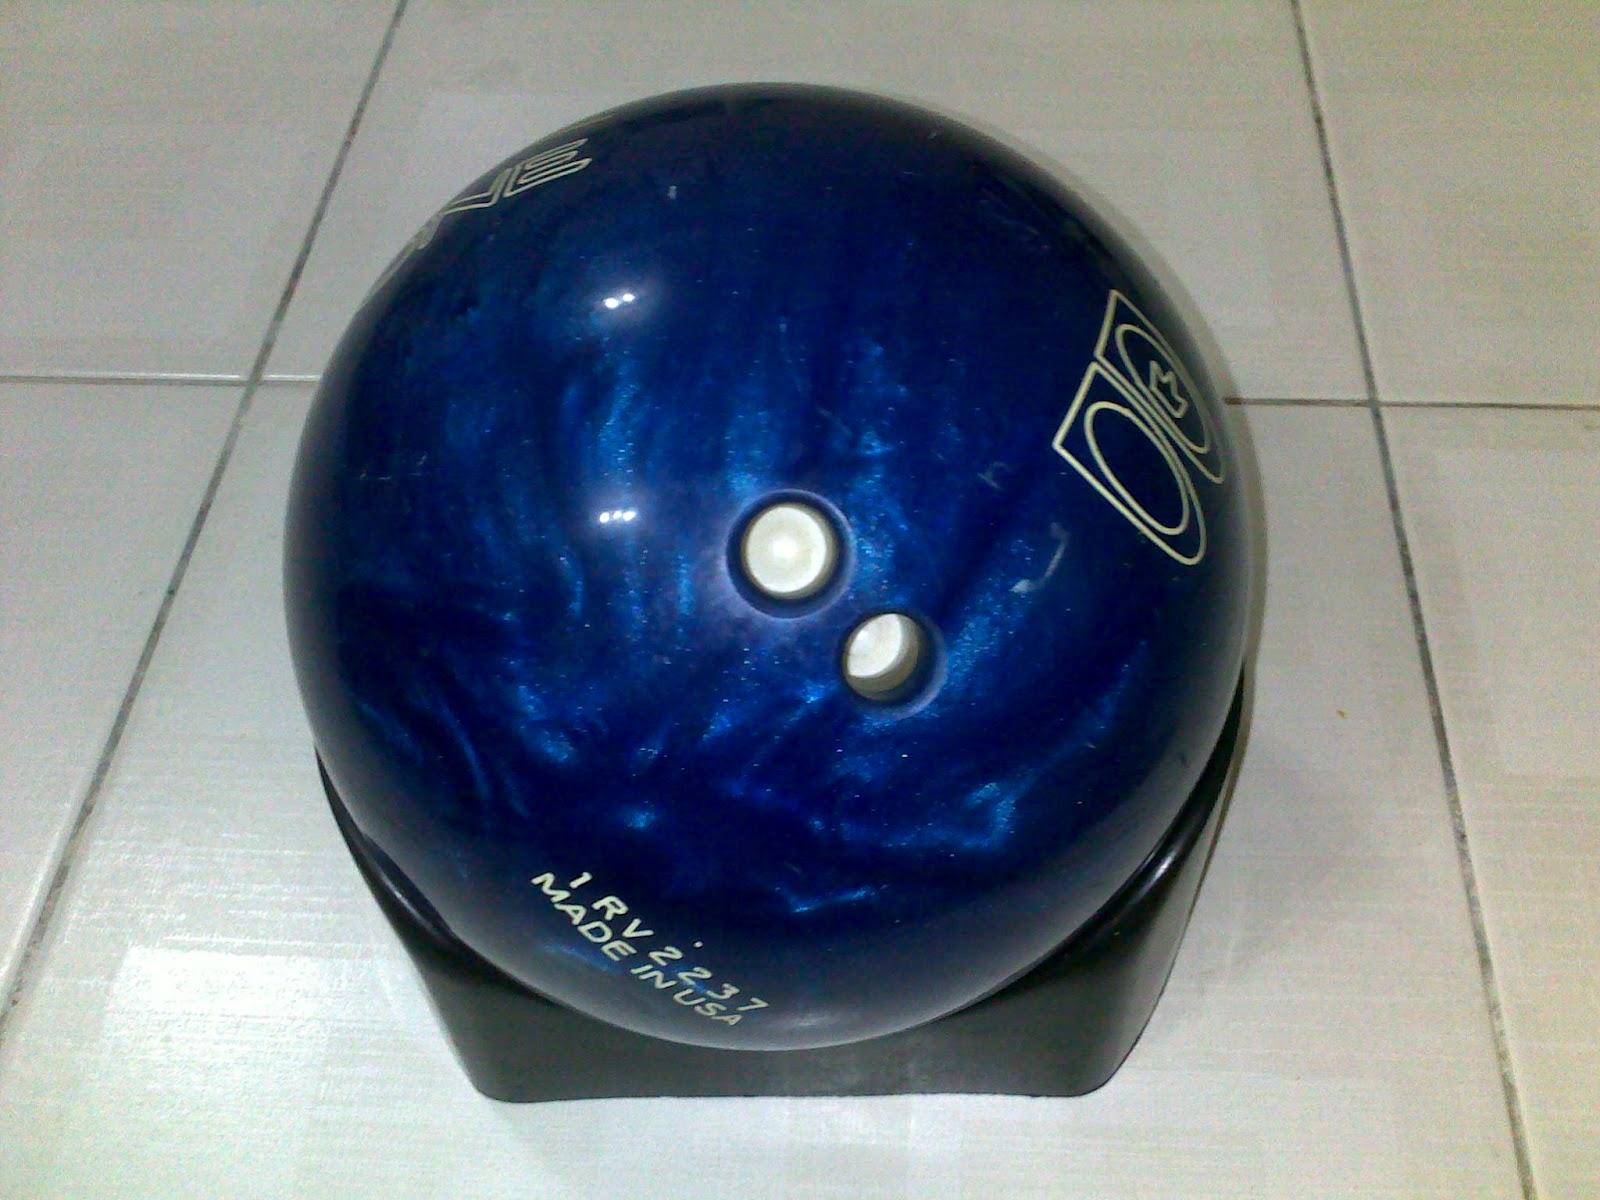 KEDAI BOWLING ONLINE: BOWLING BALL BRUNSWICK ZONE 15 LBS++